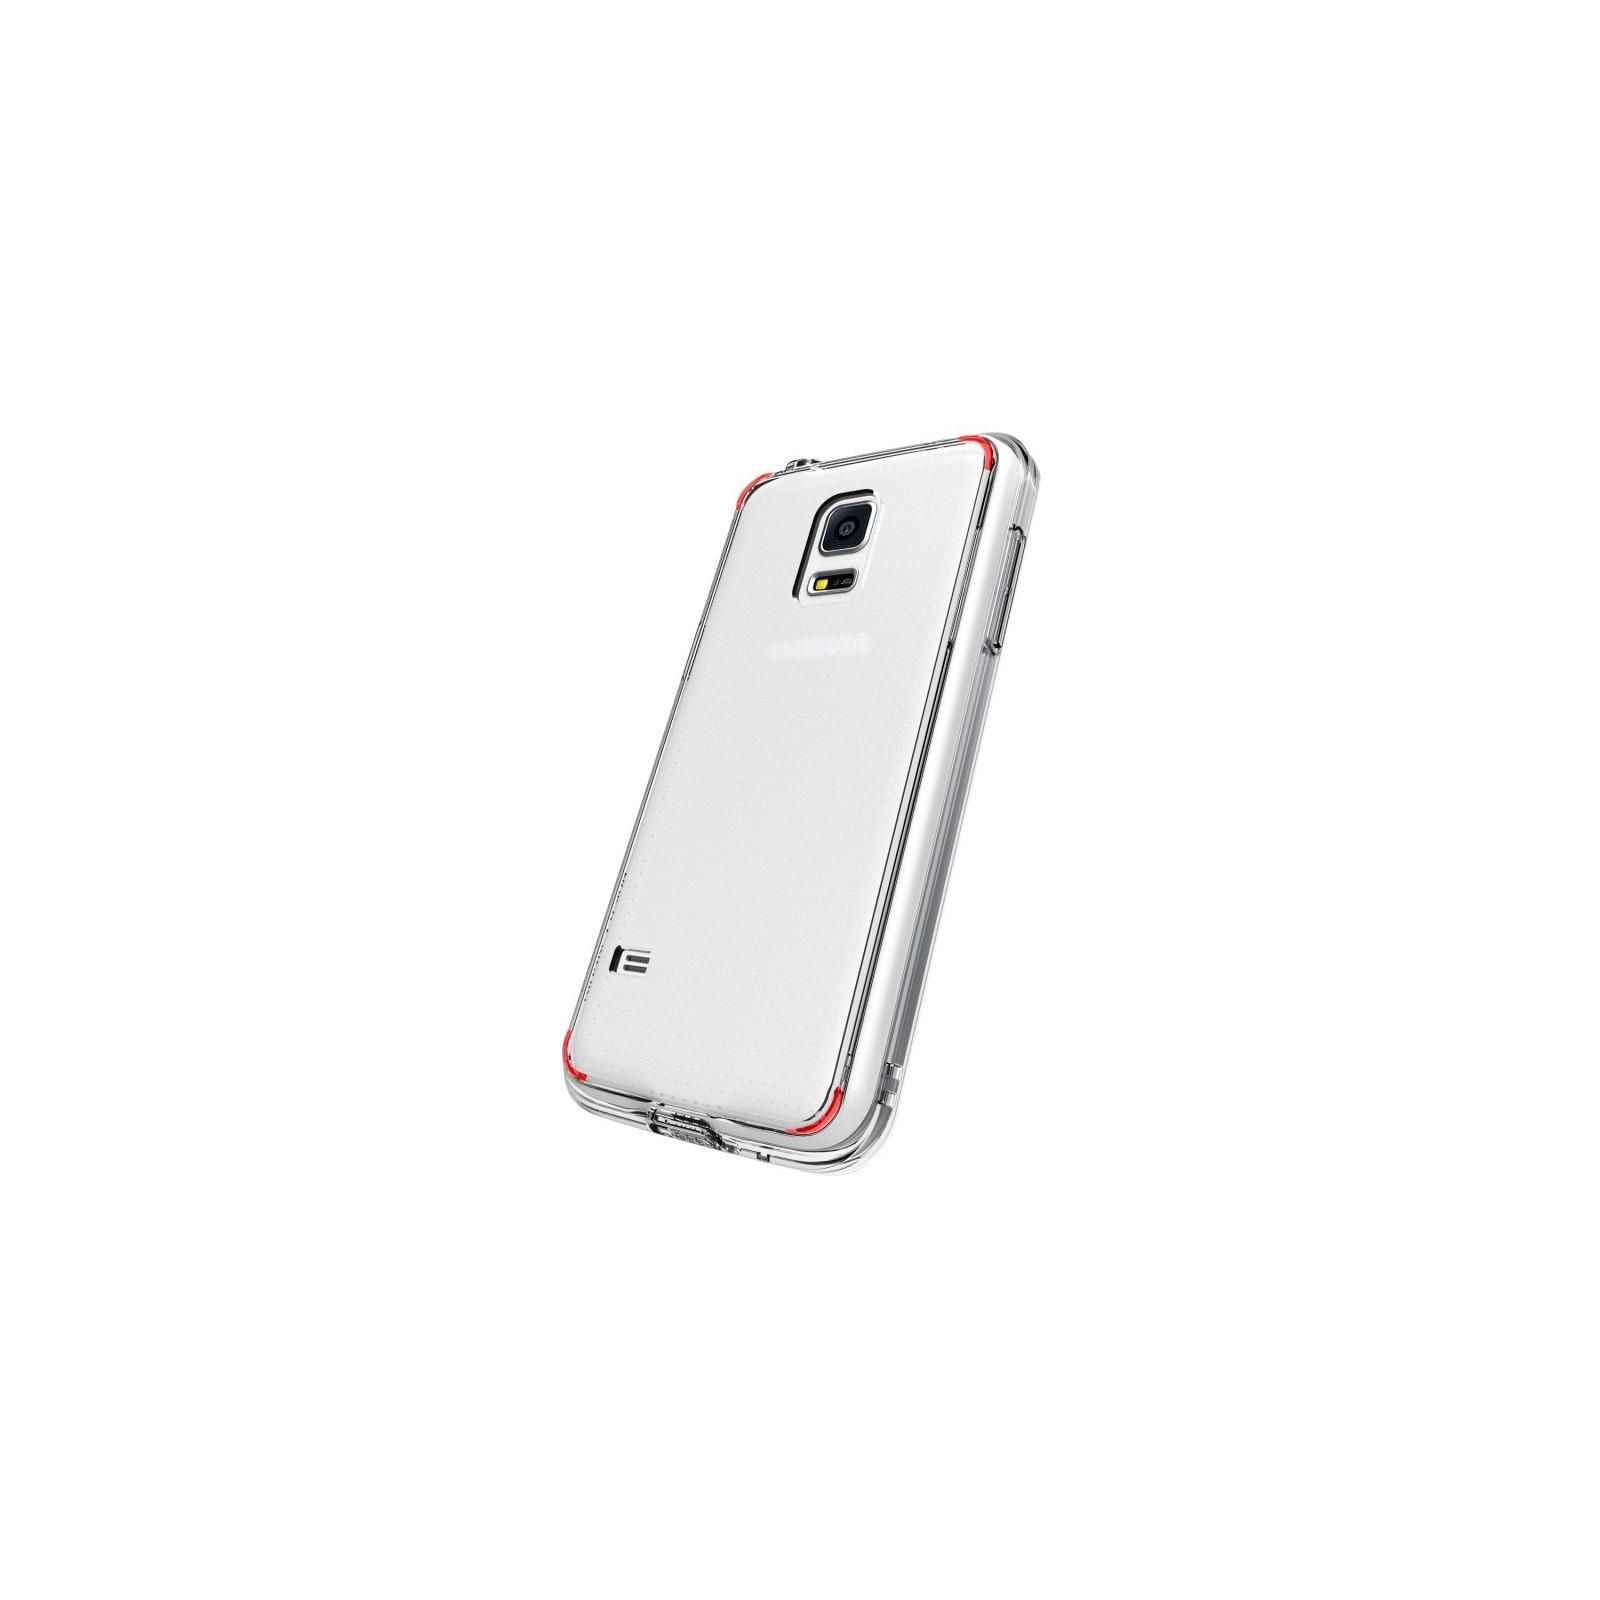 Чехол для моб. телефона Ringke Fusion для Samsung Galaxy S5 mini (Crystal View) (550661) изображение 2